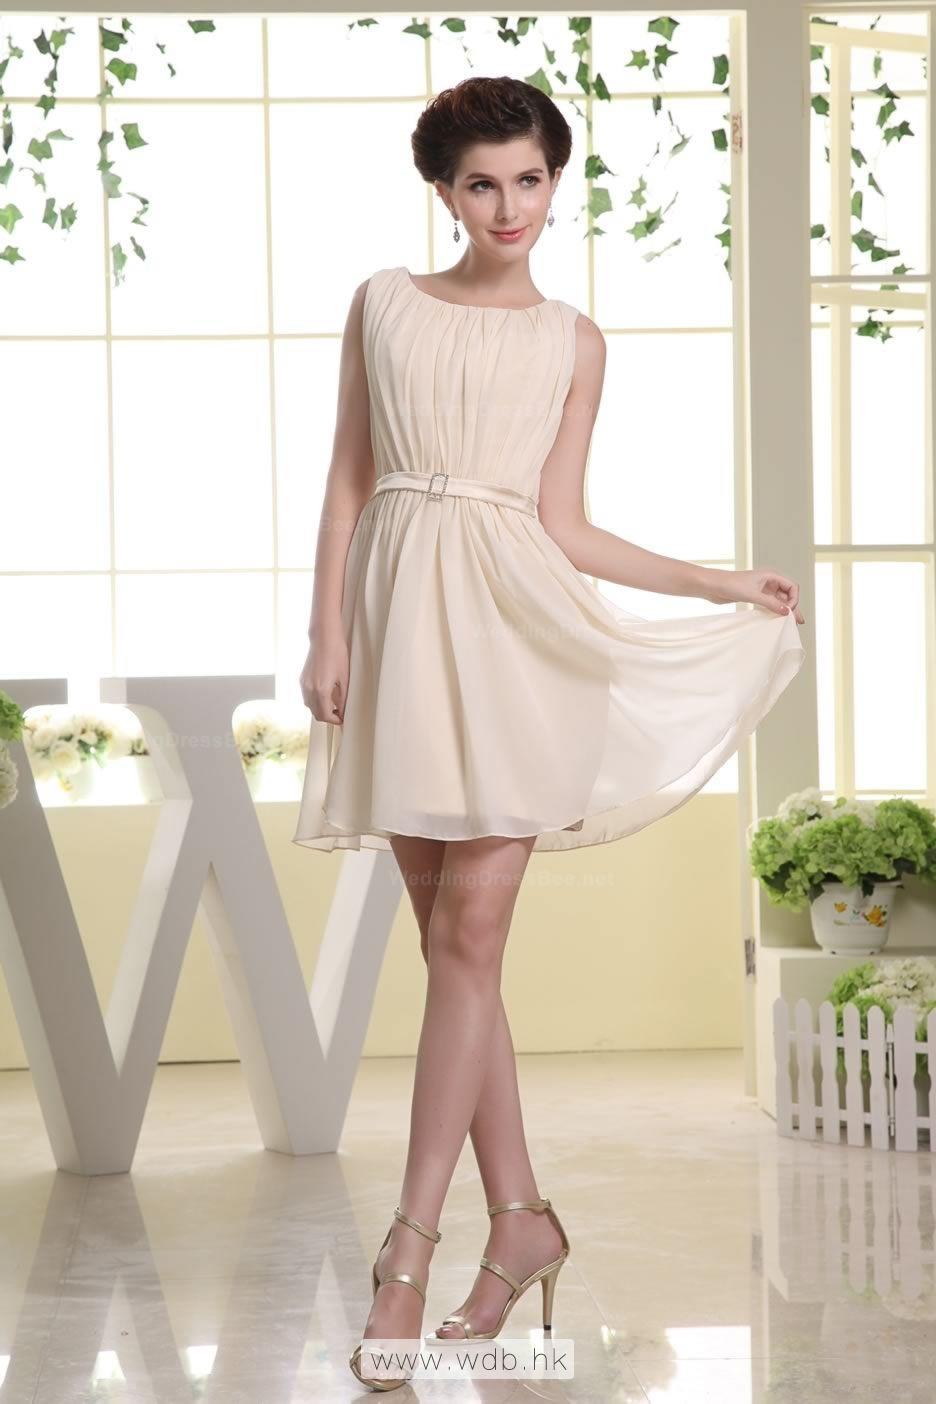 Fine scoop aline above knee chiffon dress with pleats